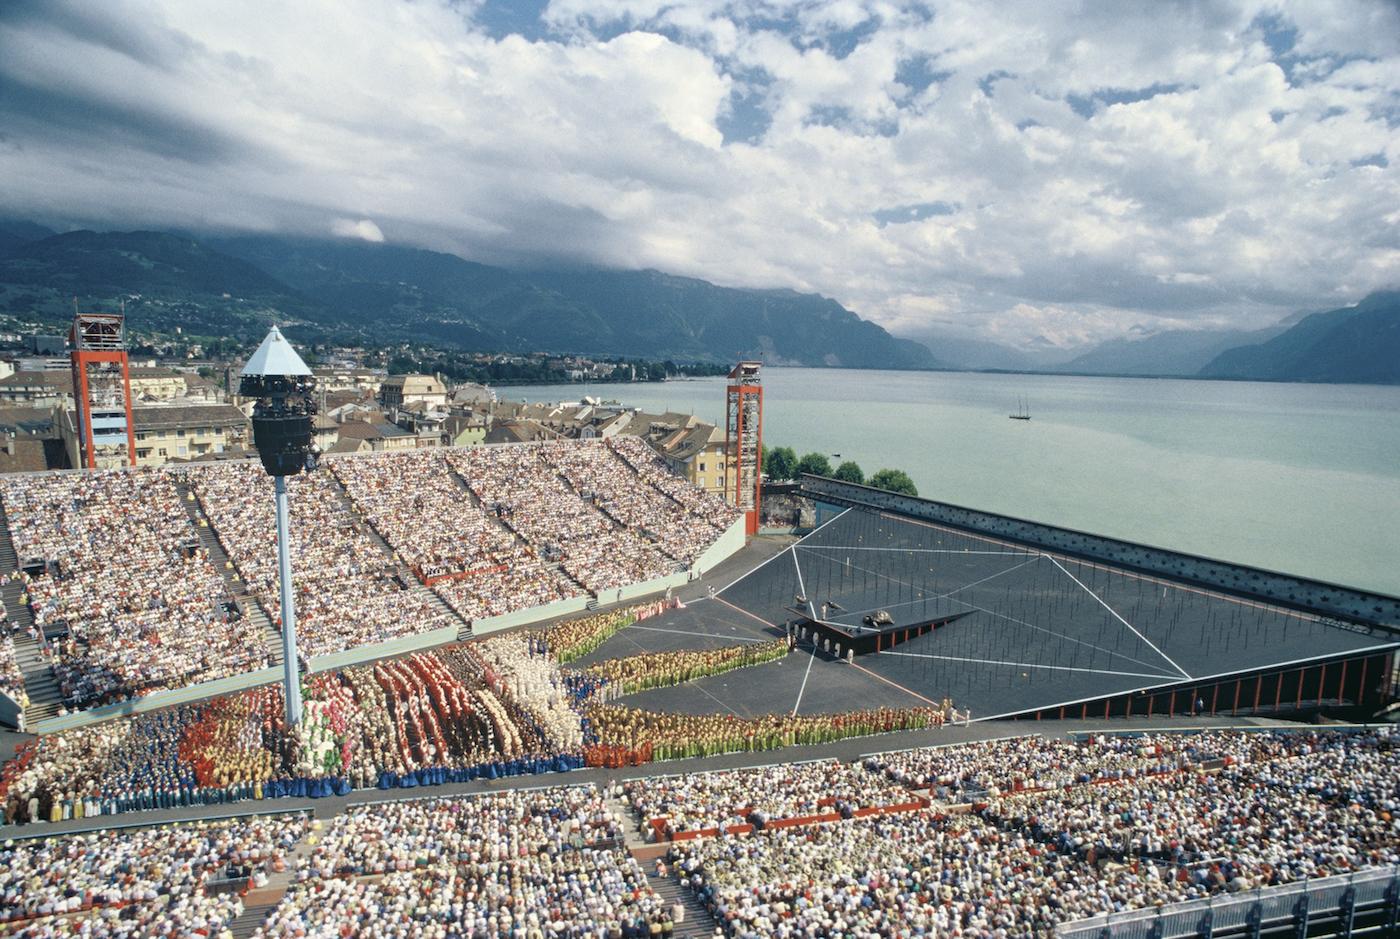 Rendering della gigantesca arena che a Vevey ospiterà la Fête des Vignerons 2019